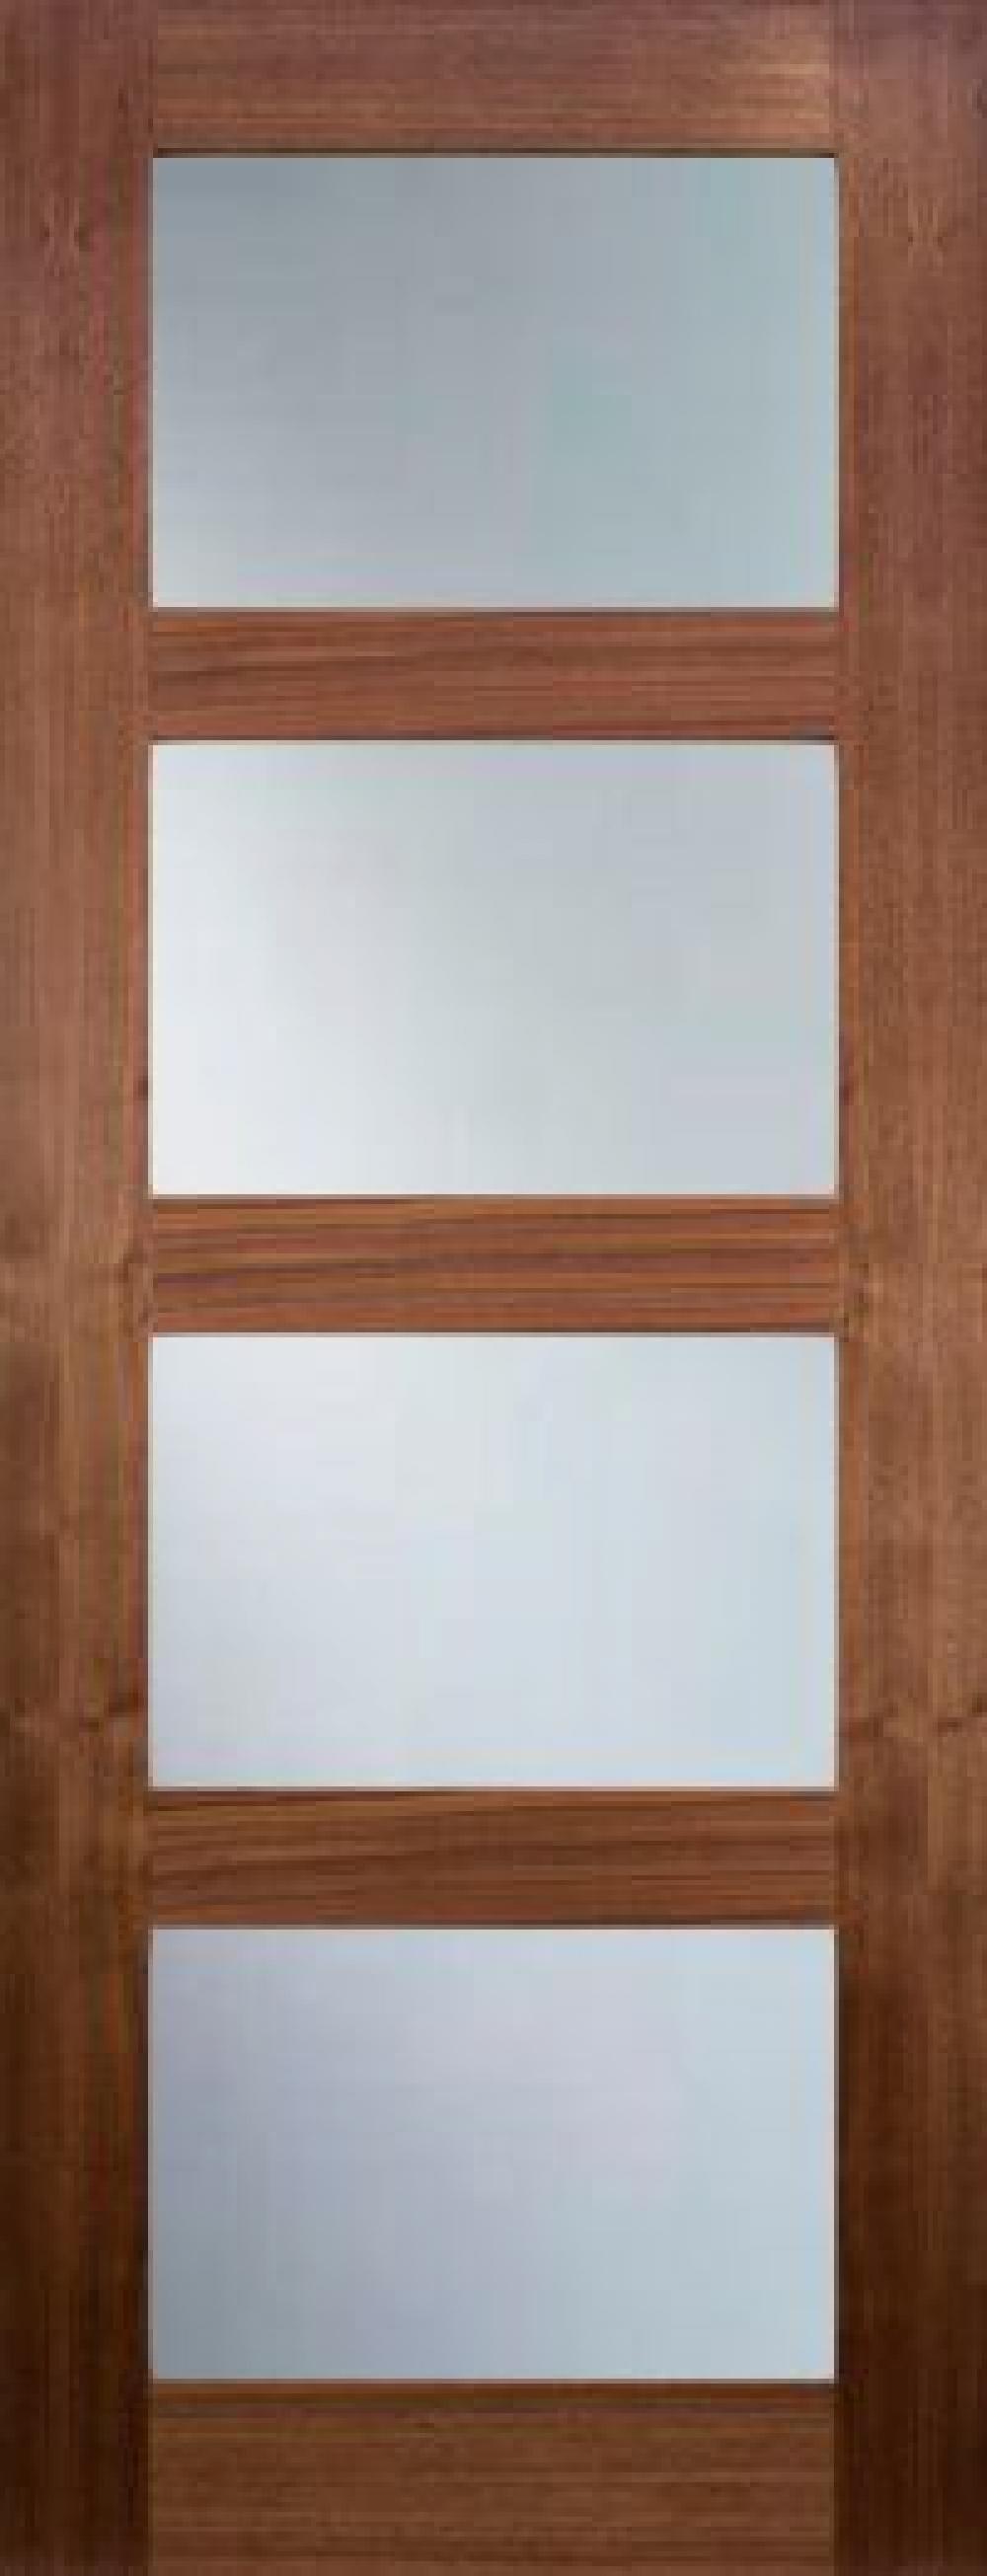 Coventry Walnut Glazed - Clear Prefinished Image